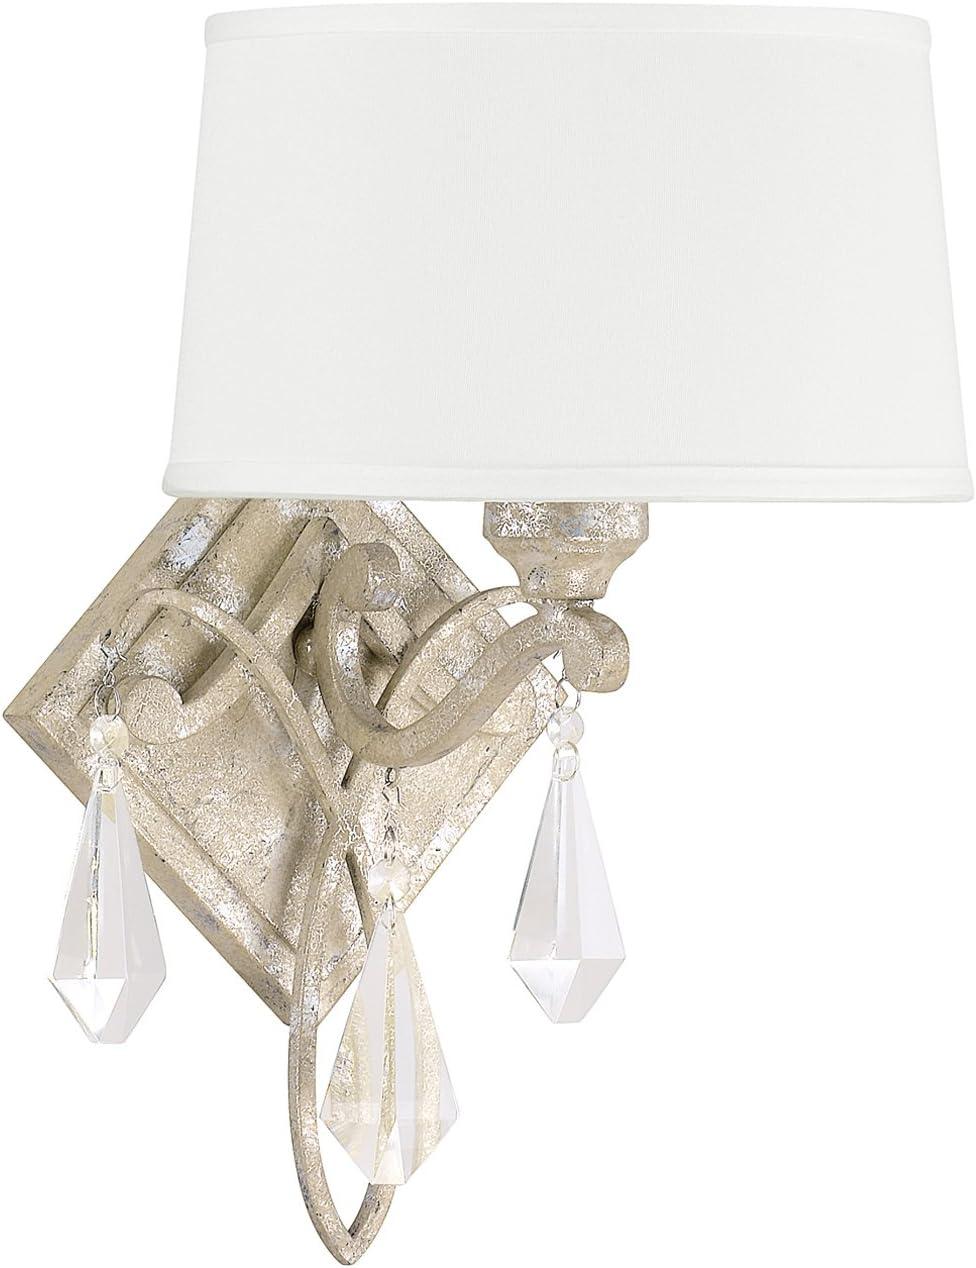 4221WG-549-CR Capital Lighting Wall Sconce